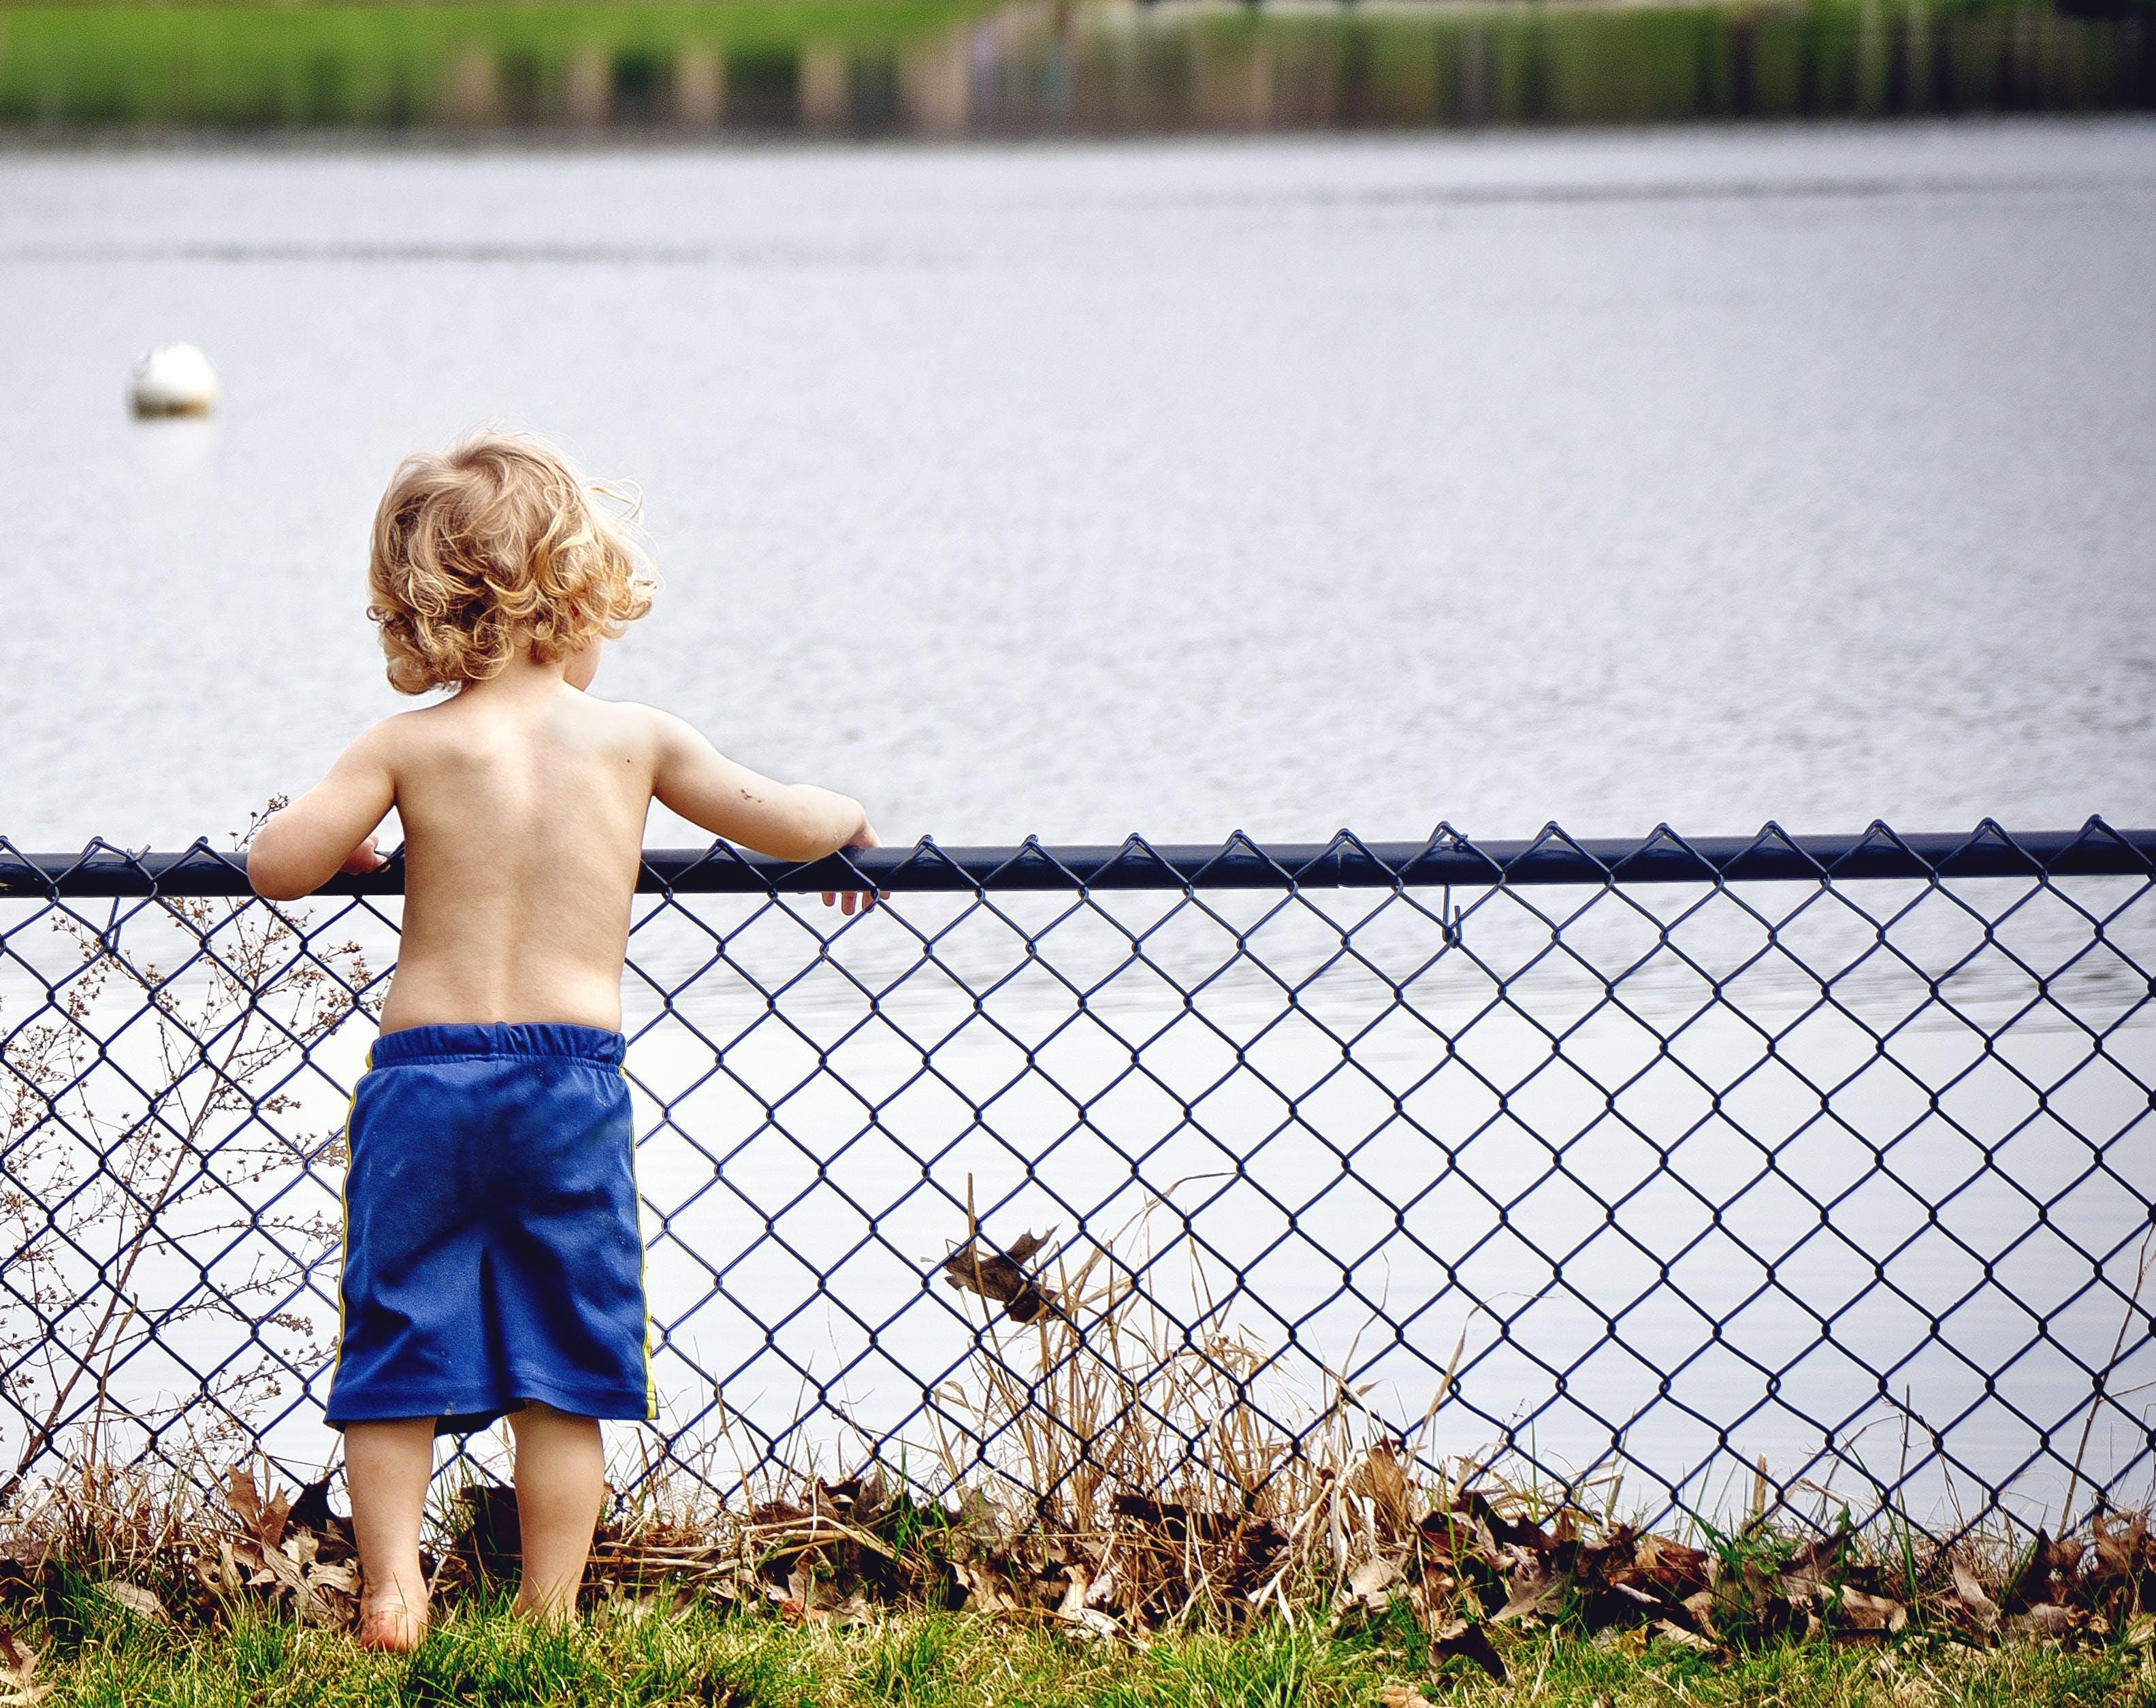 boy, child, fence